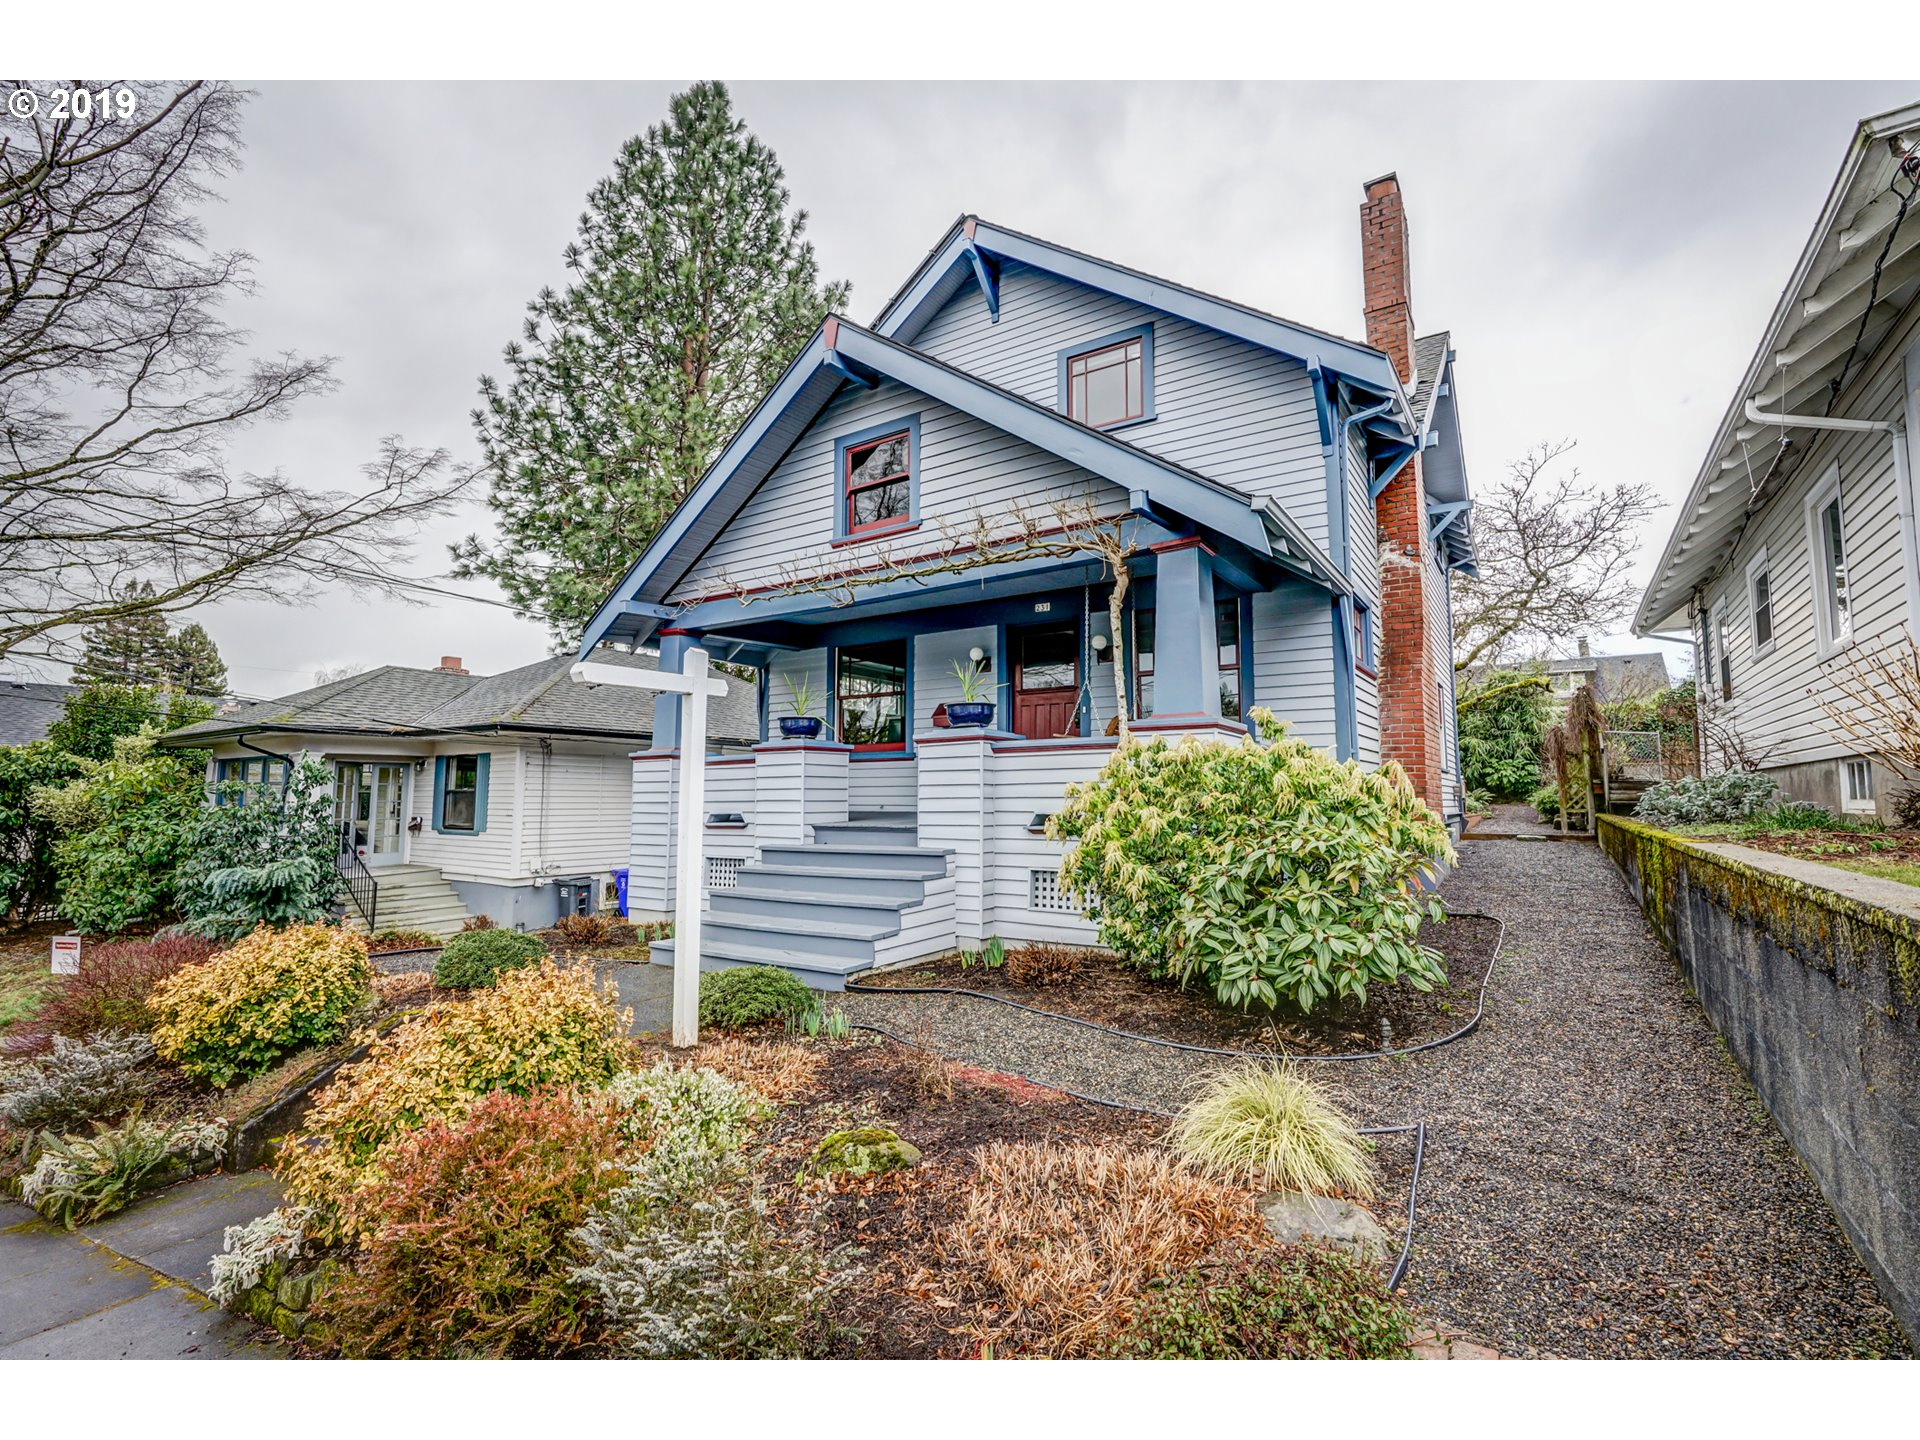 231 NE 45TH AVE Portland, OR 97213 19170874